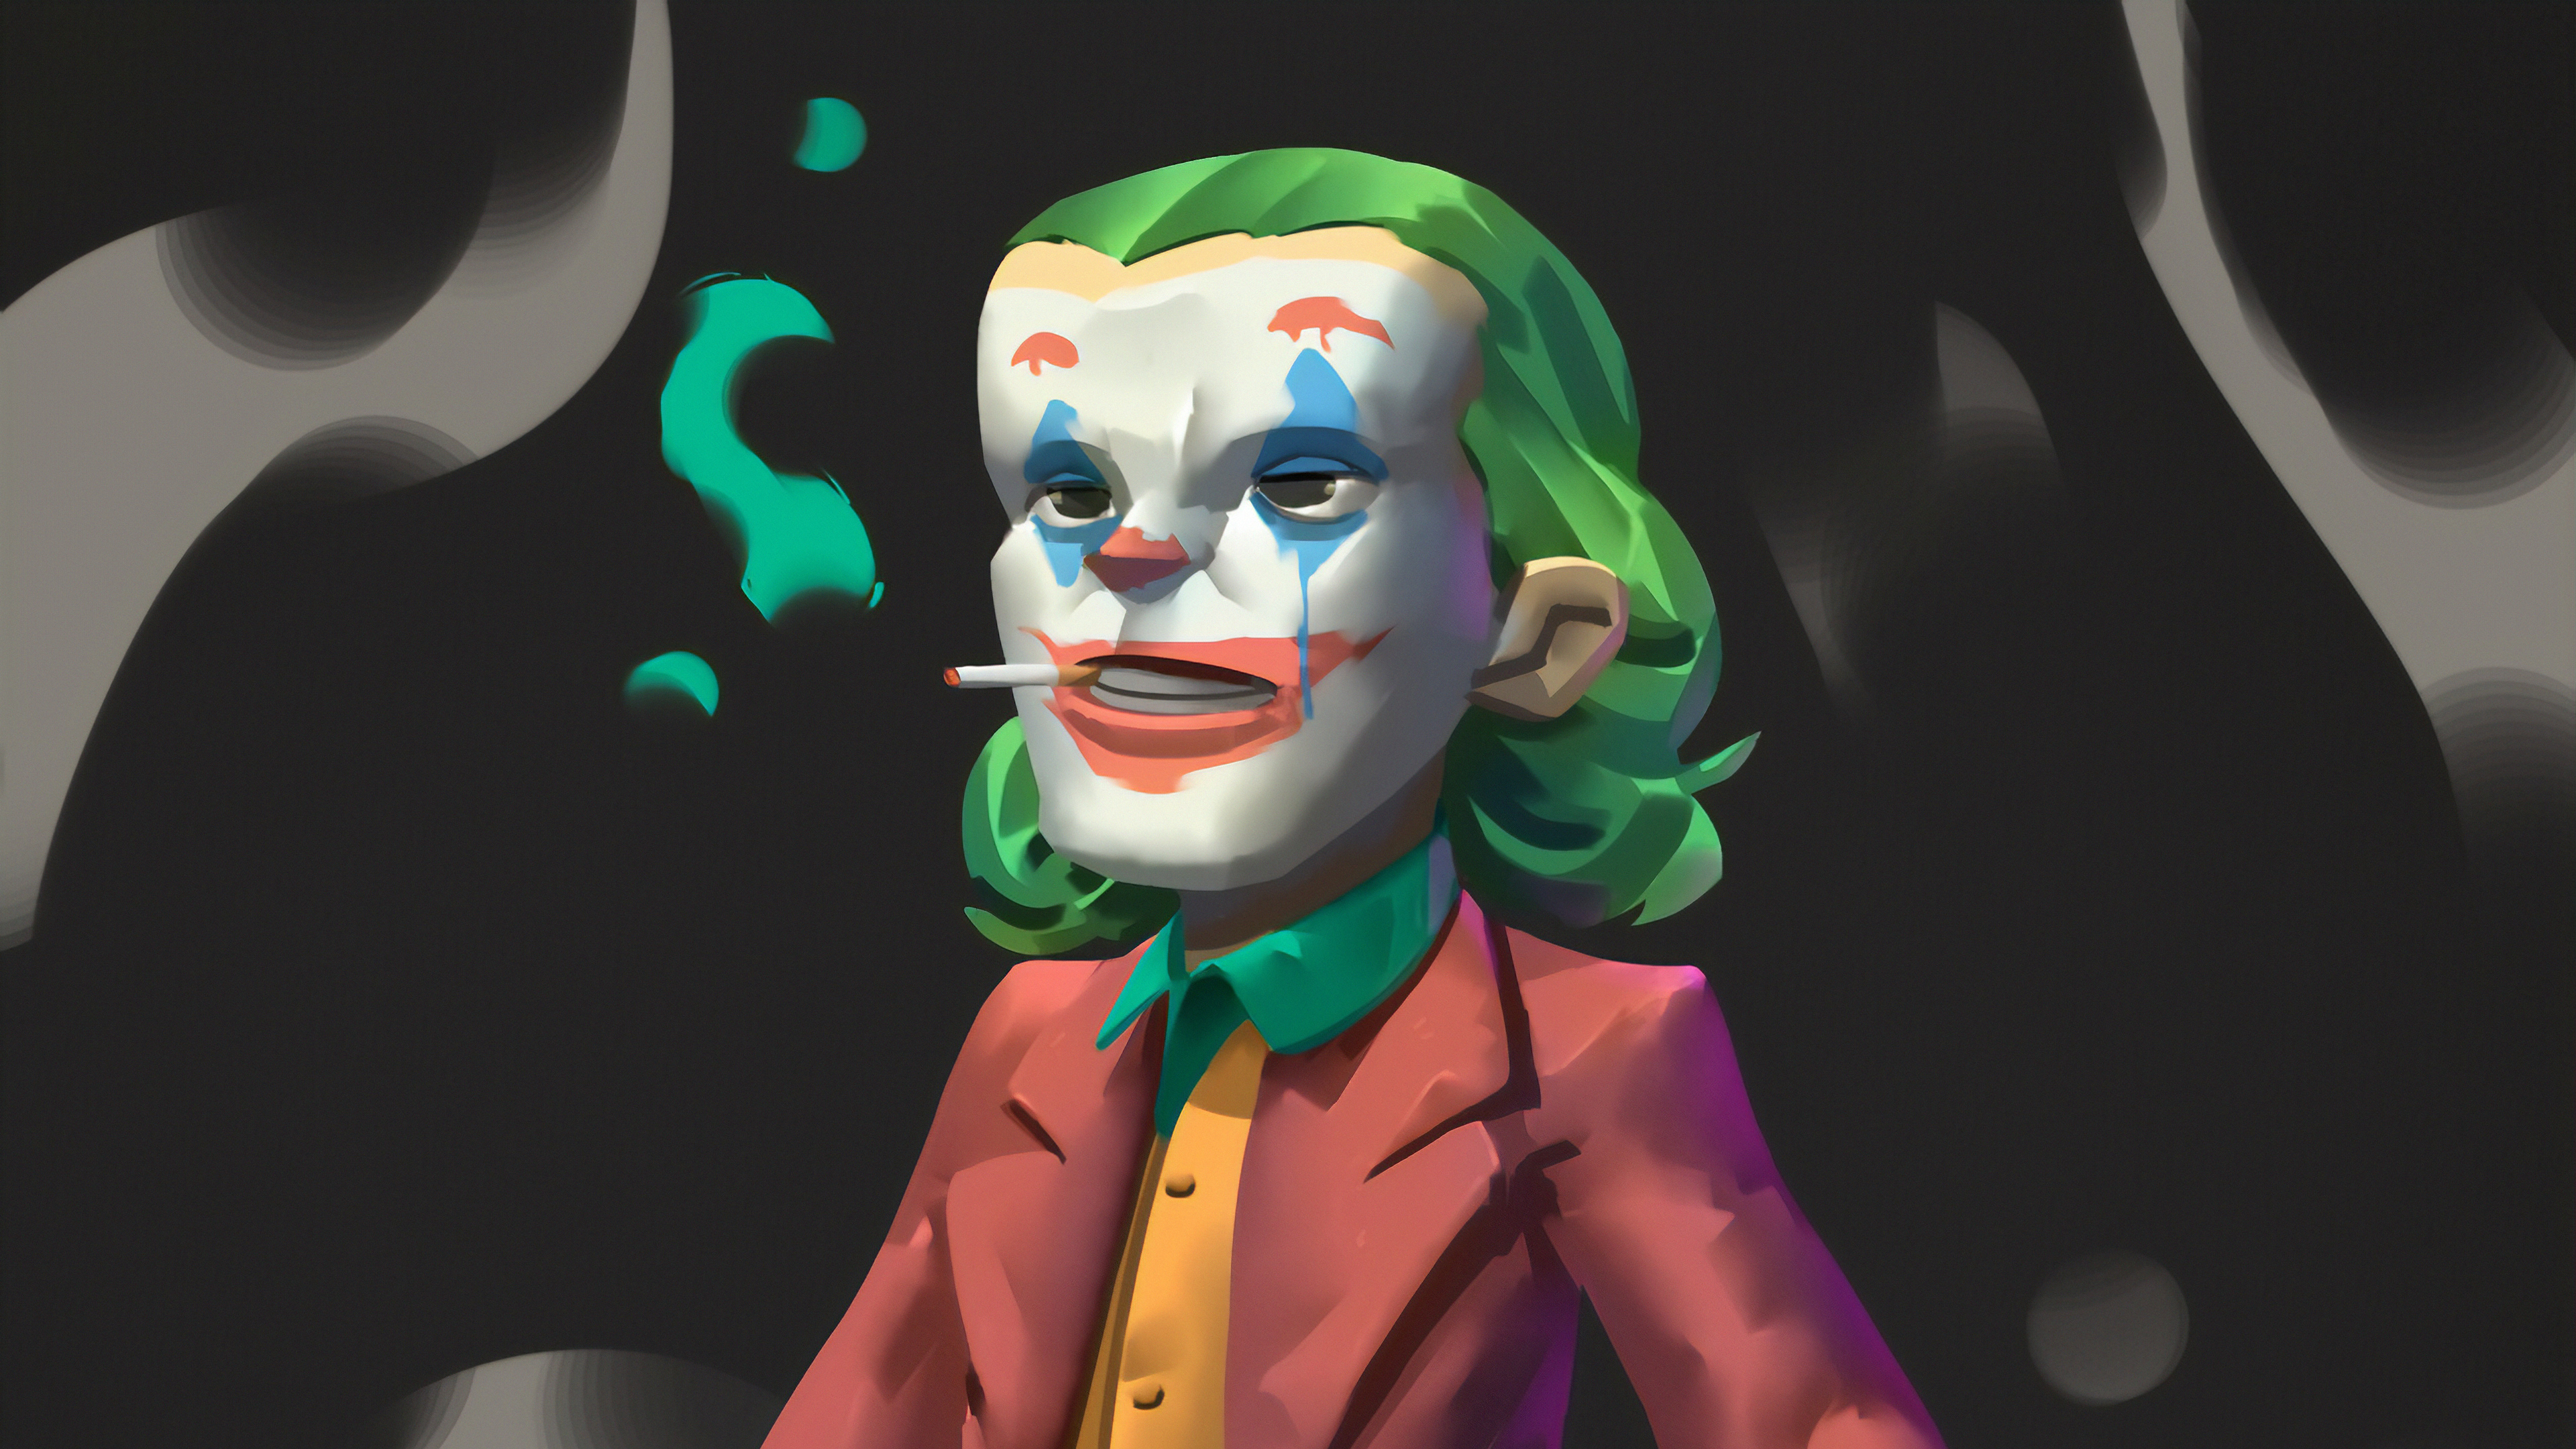 joker cigratte smoking art 1572367500 - Joker Cigratte Smoking Art - superheroes wallpapers, joker wallpapers, hd-wallpapers, dc comics wallpapers, artstation wallpapers, 4k-wallpapers